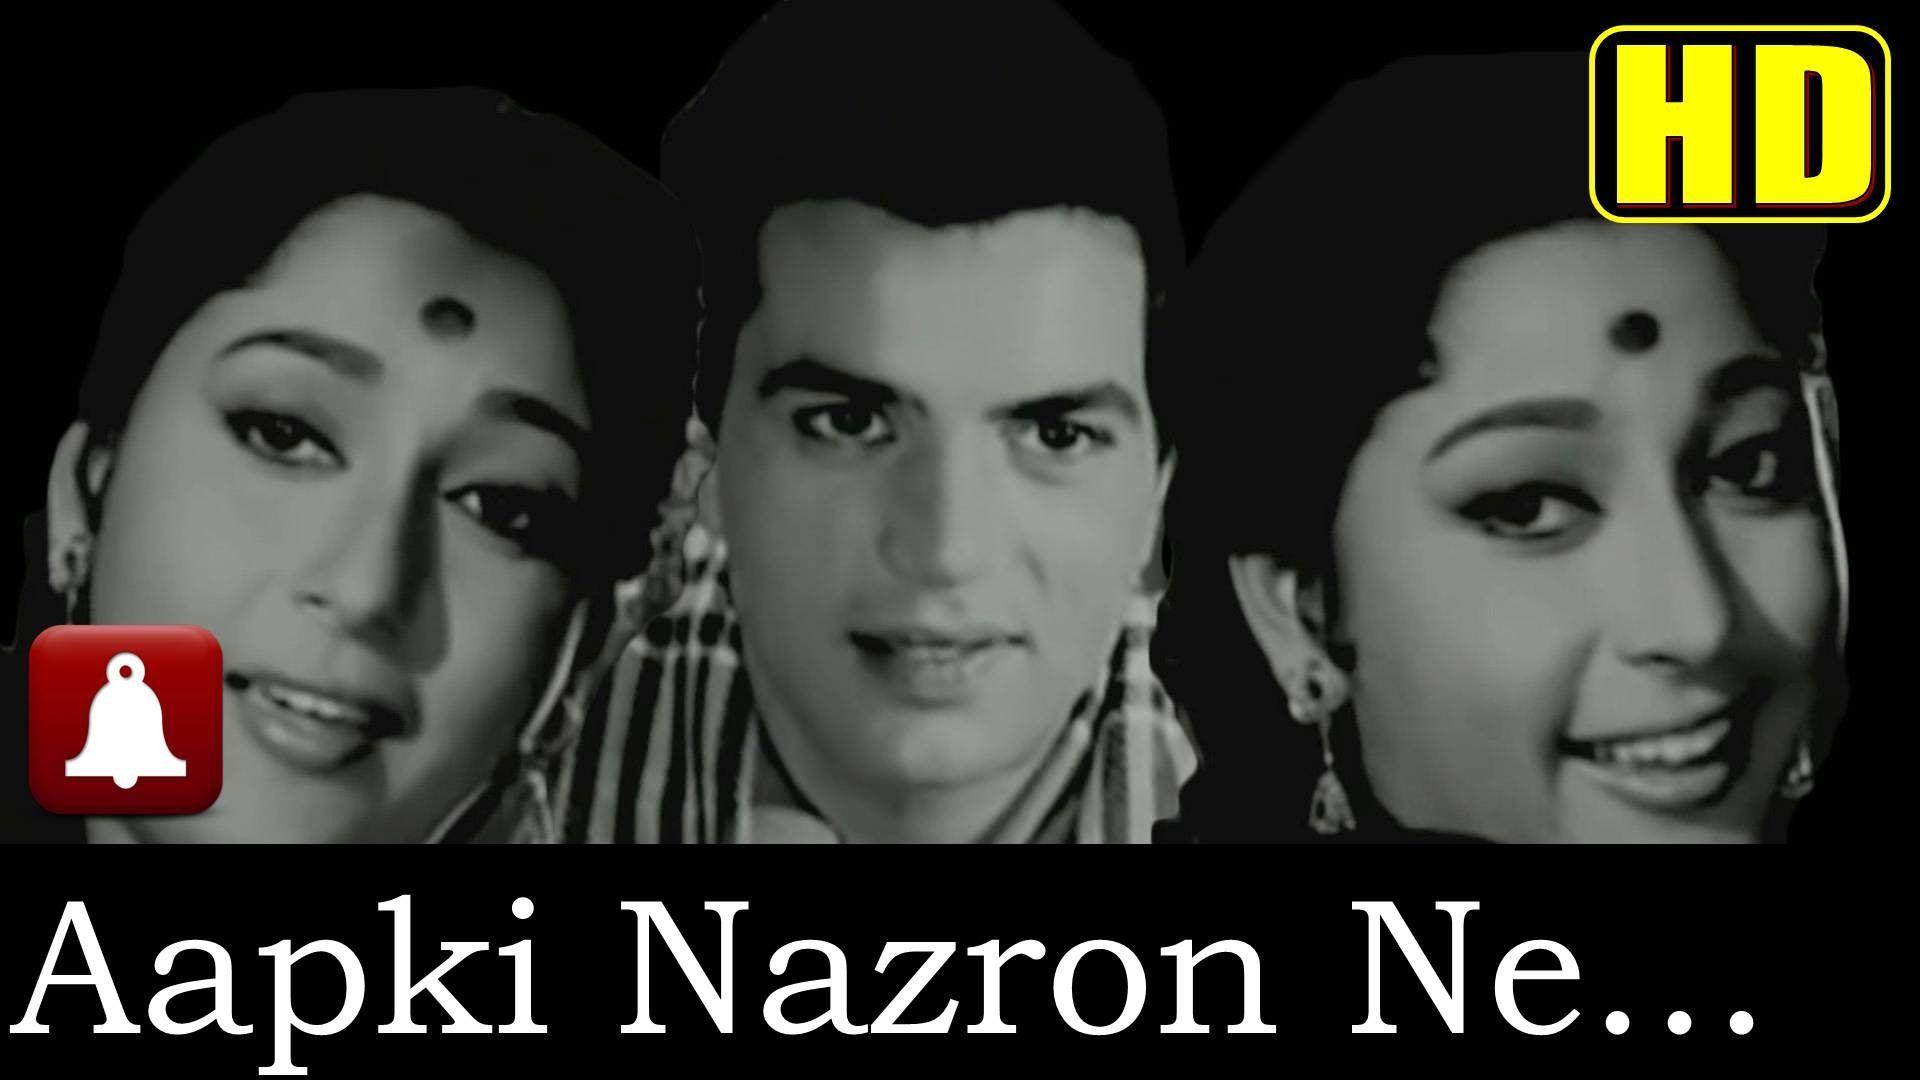 Aapki Nazron Ne Samjha (HD)(Dolby Digital) - Lata Mangeshkar